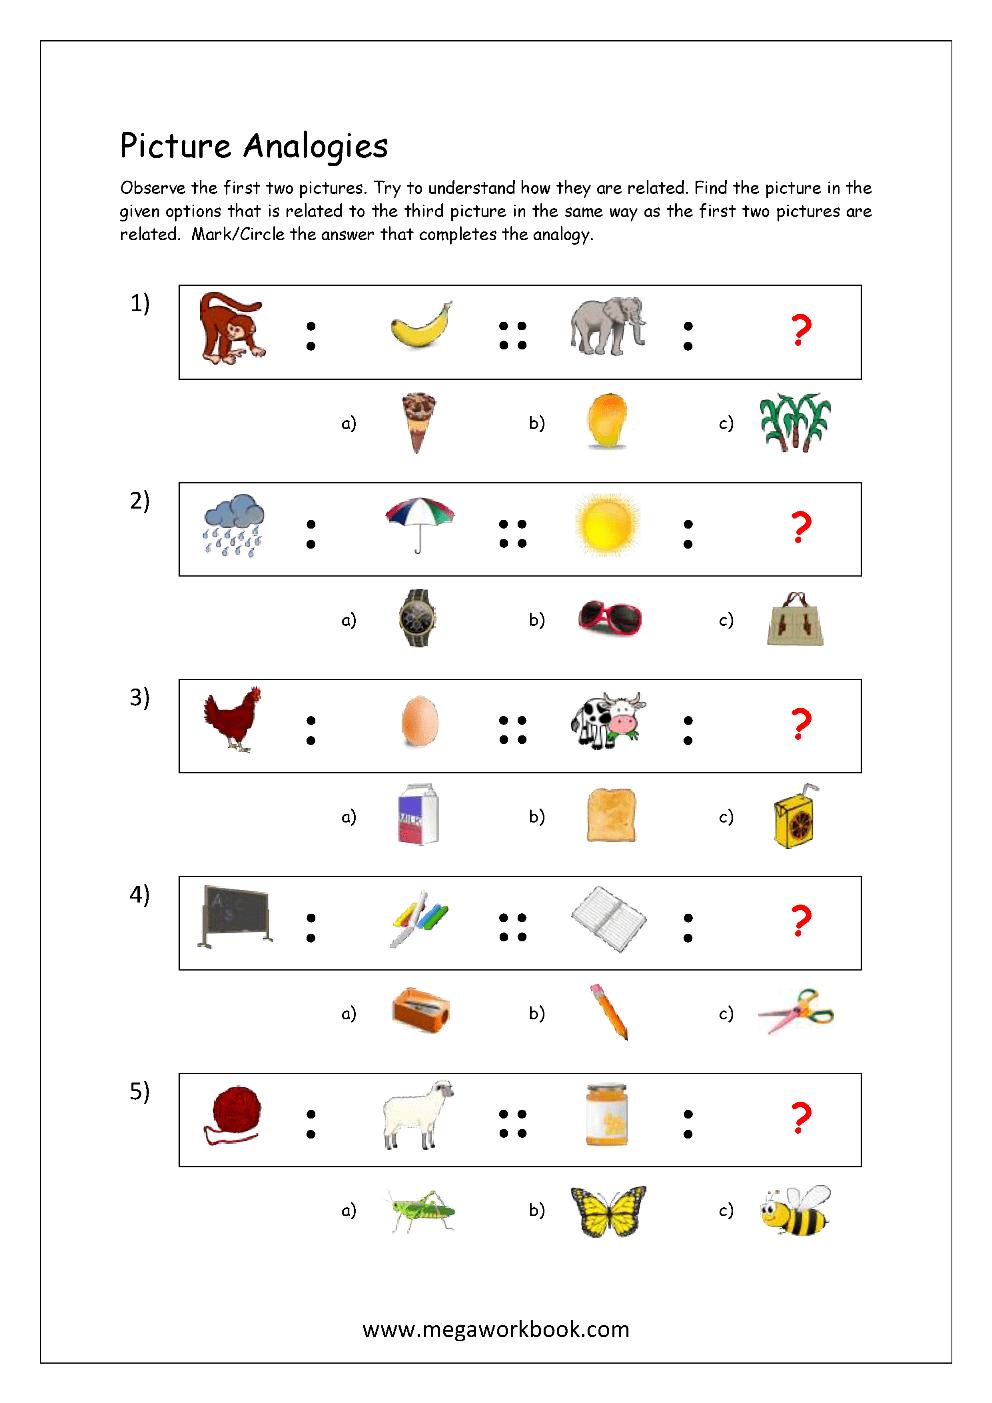 medium resolution of Free Printable Picture Analogy Worksheets - Logical Reasoning - MegaWorkbook